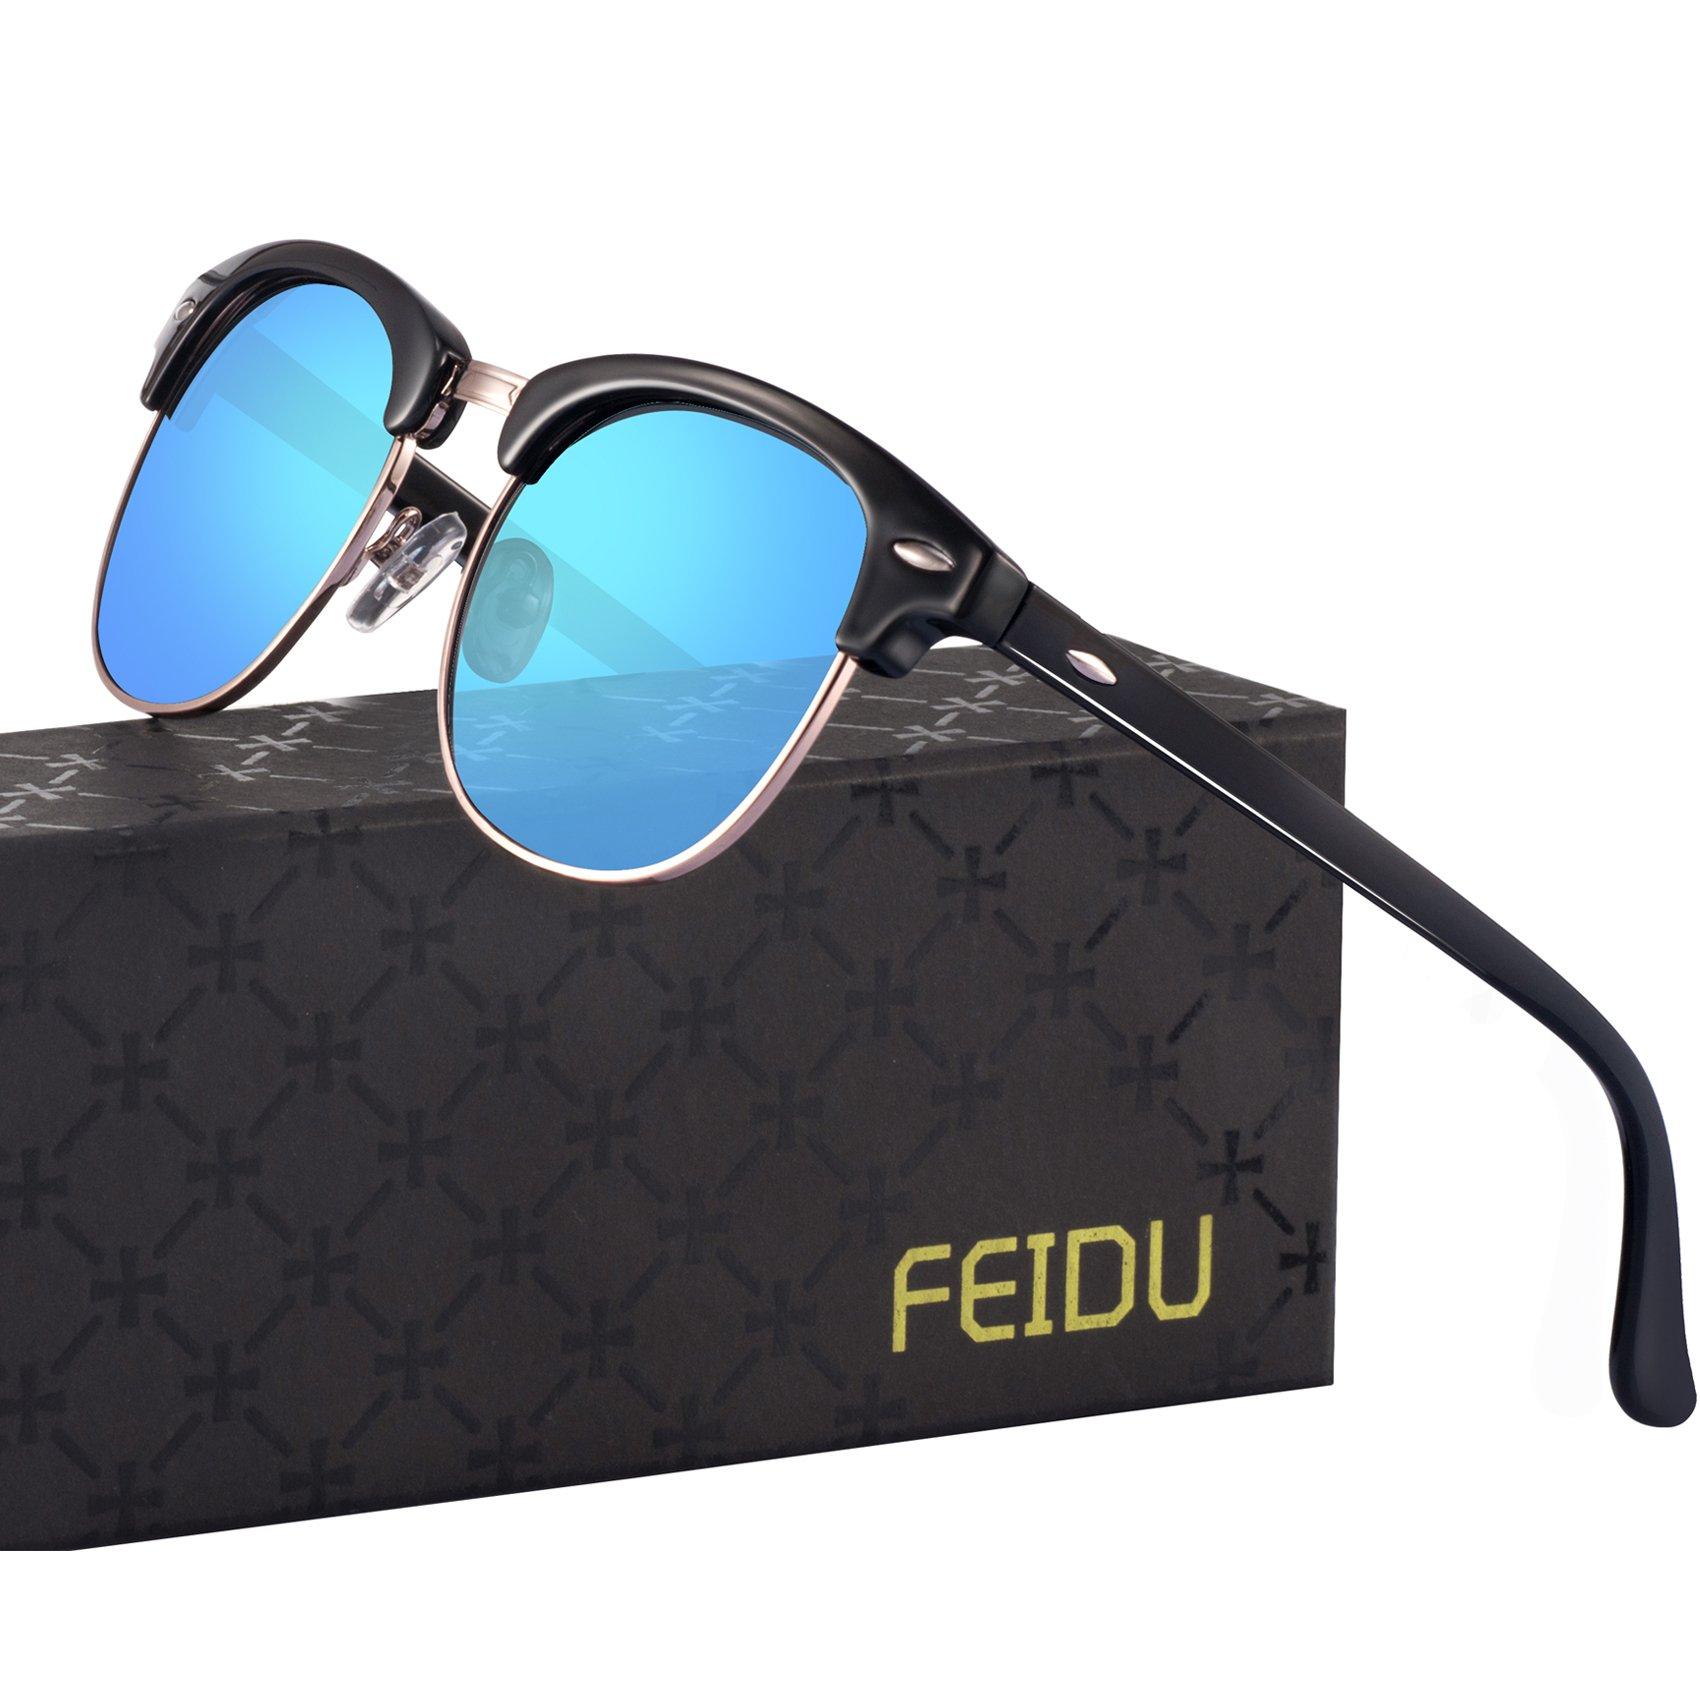 FEIDU Retro Polarized Clubmaster Sunglasses for Men Half Metal Women FD3030 (blue, 2.04)